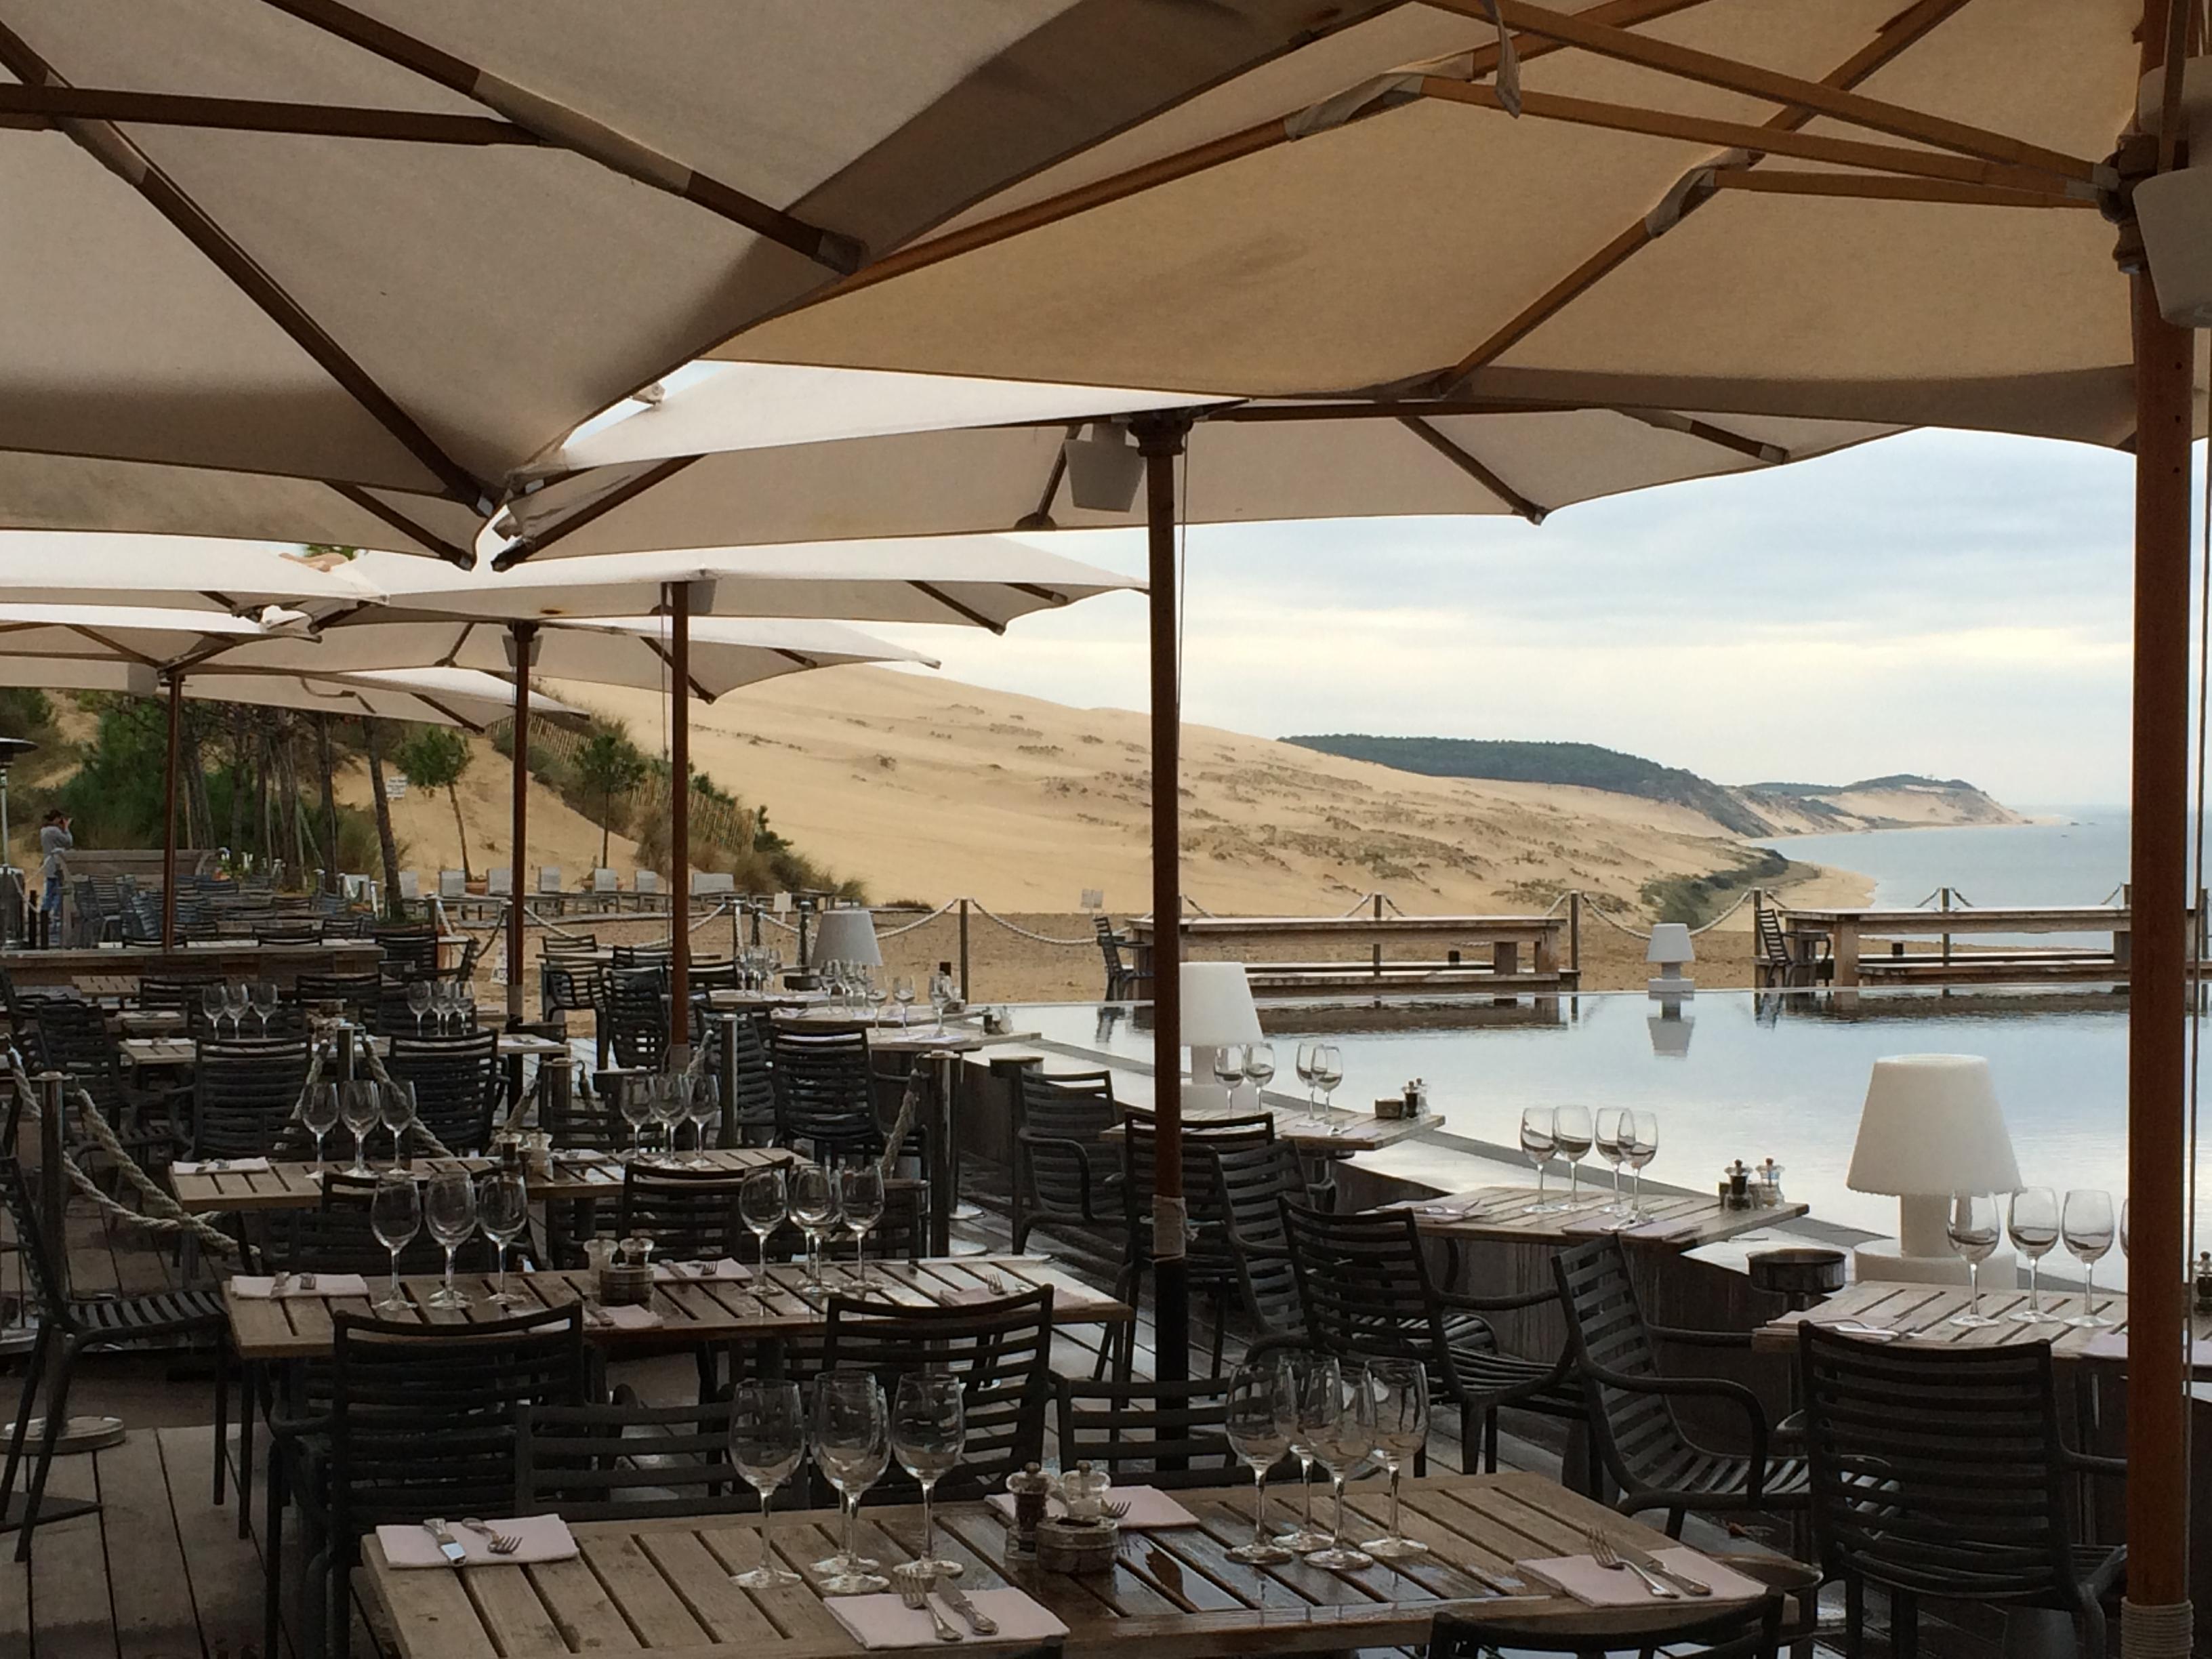 La co o rniche bordeaux eat trotter - Hotel starck arcachon ...